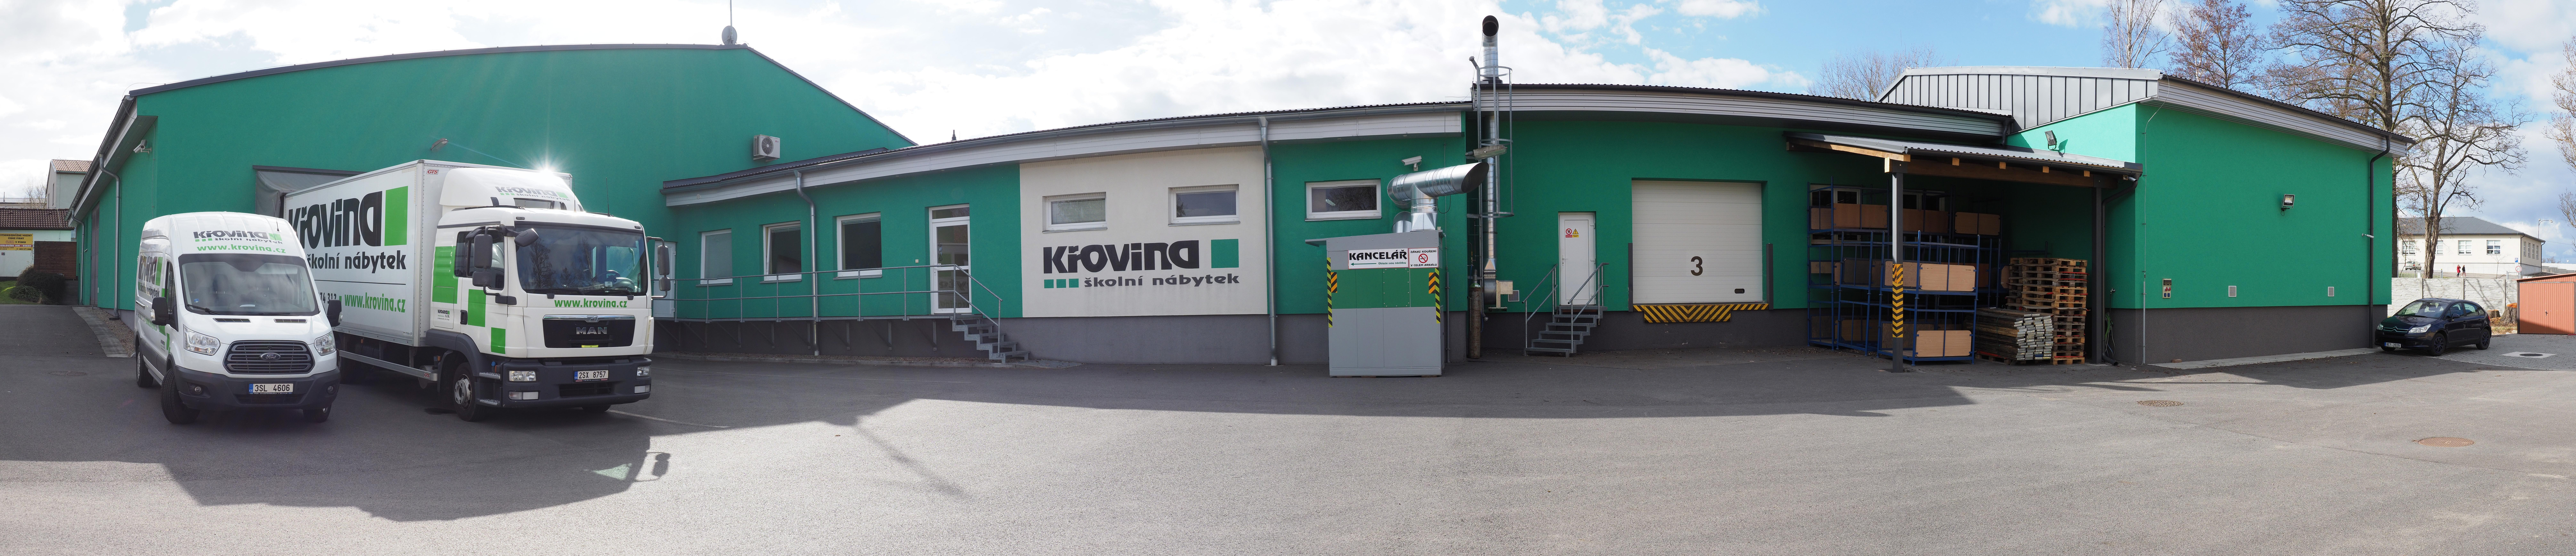 Panorama_Krovina_2019.jpg